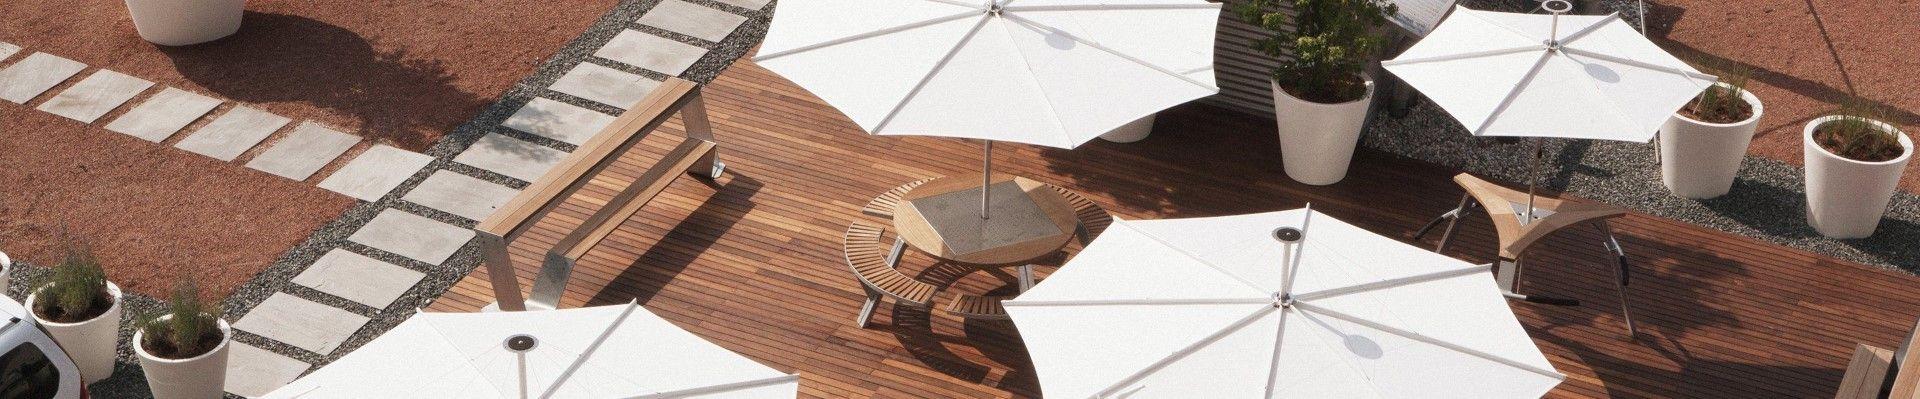 Extremis parasols